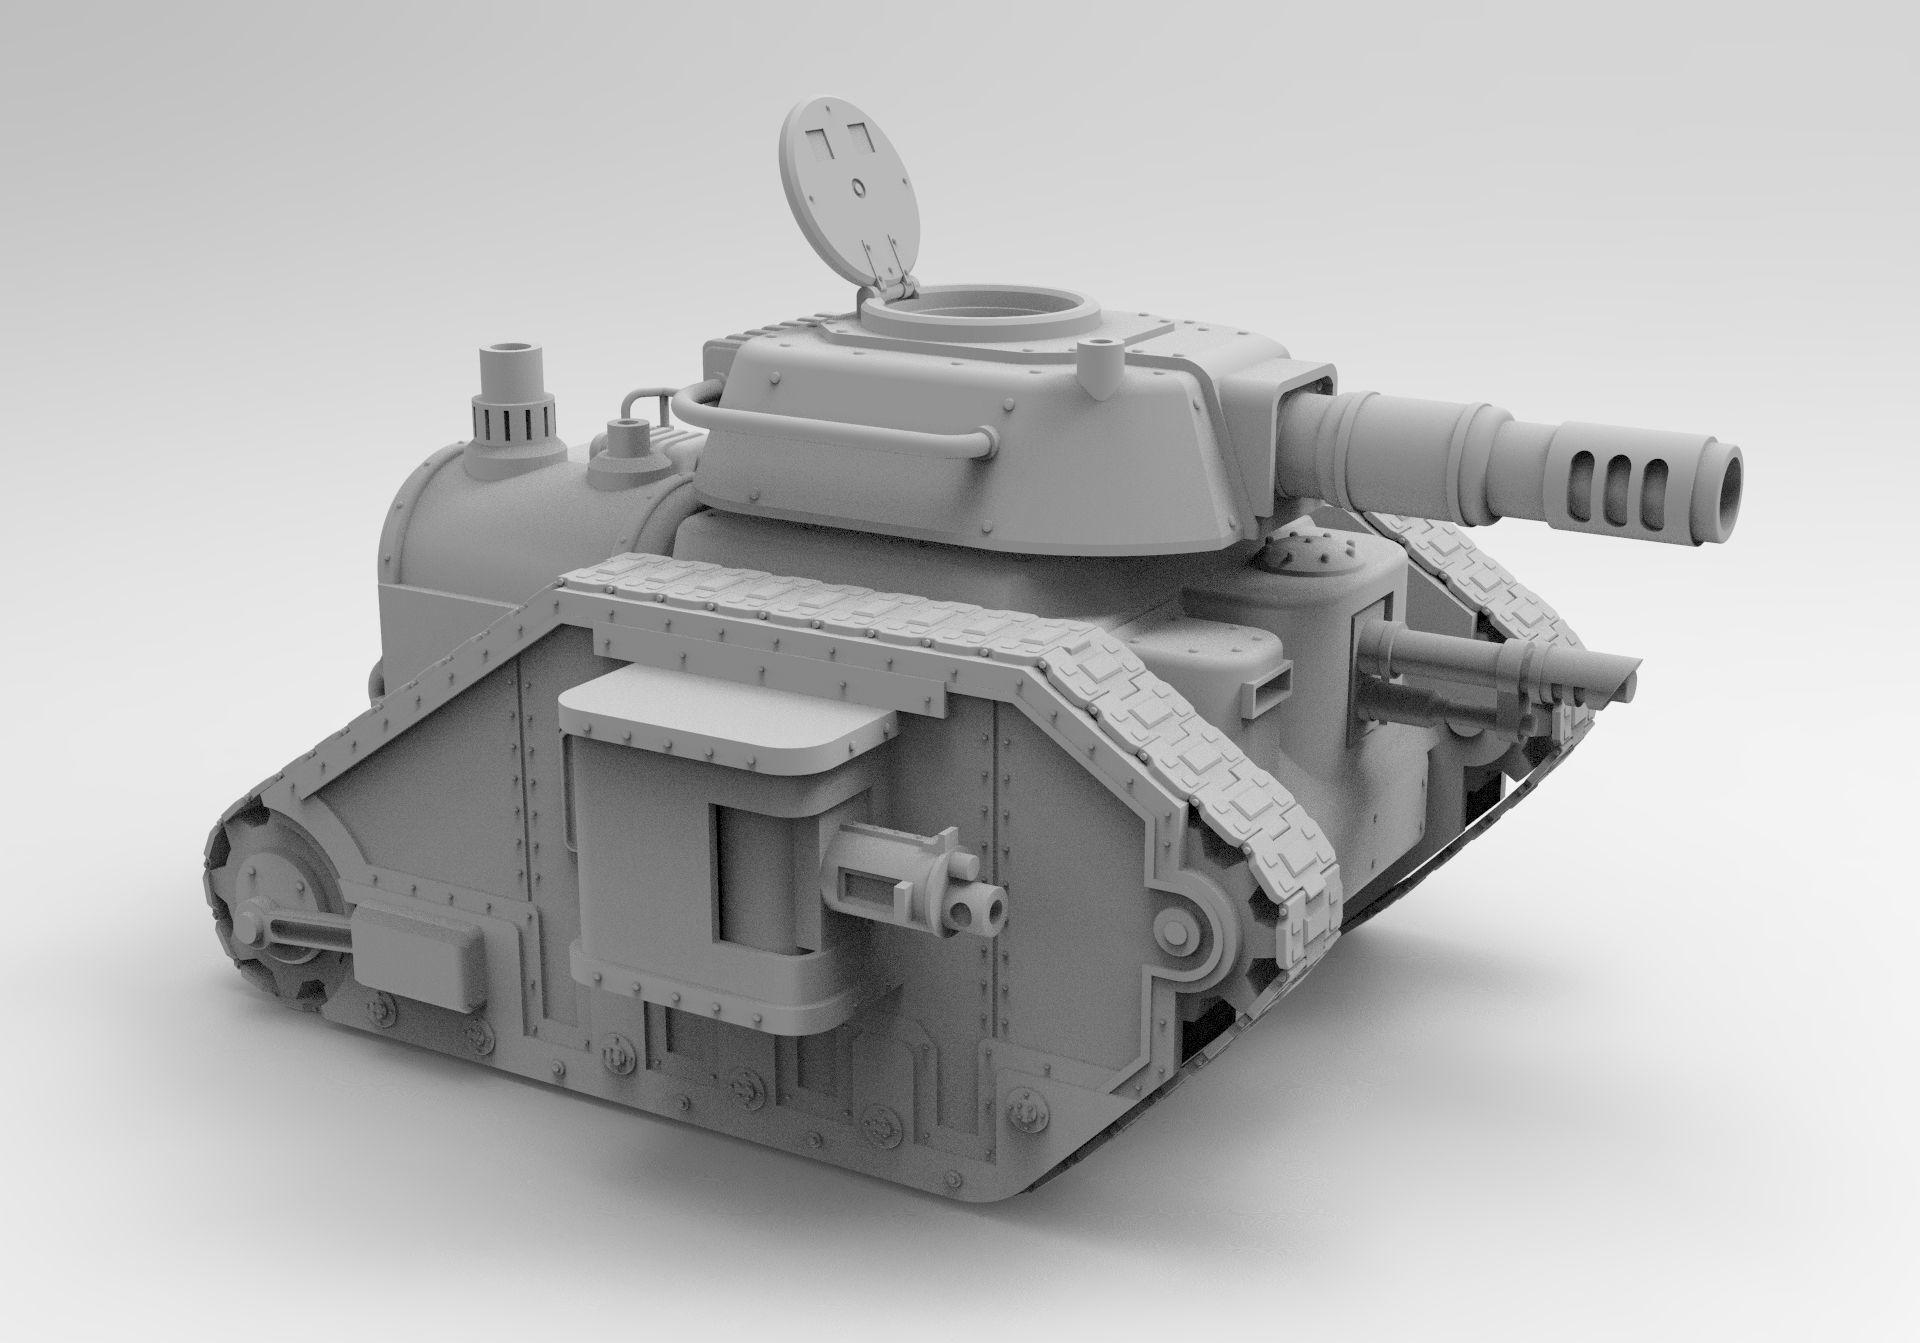 Steampunk Imperial tank